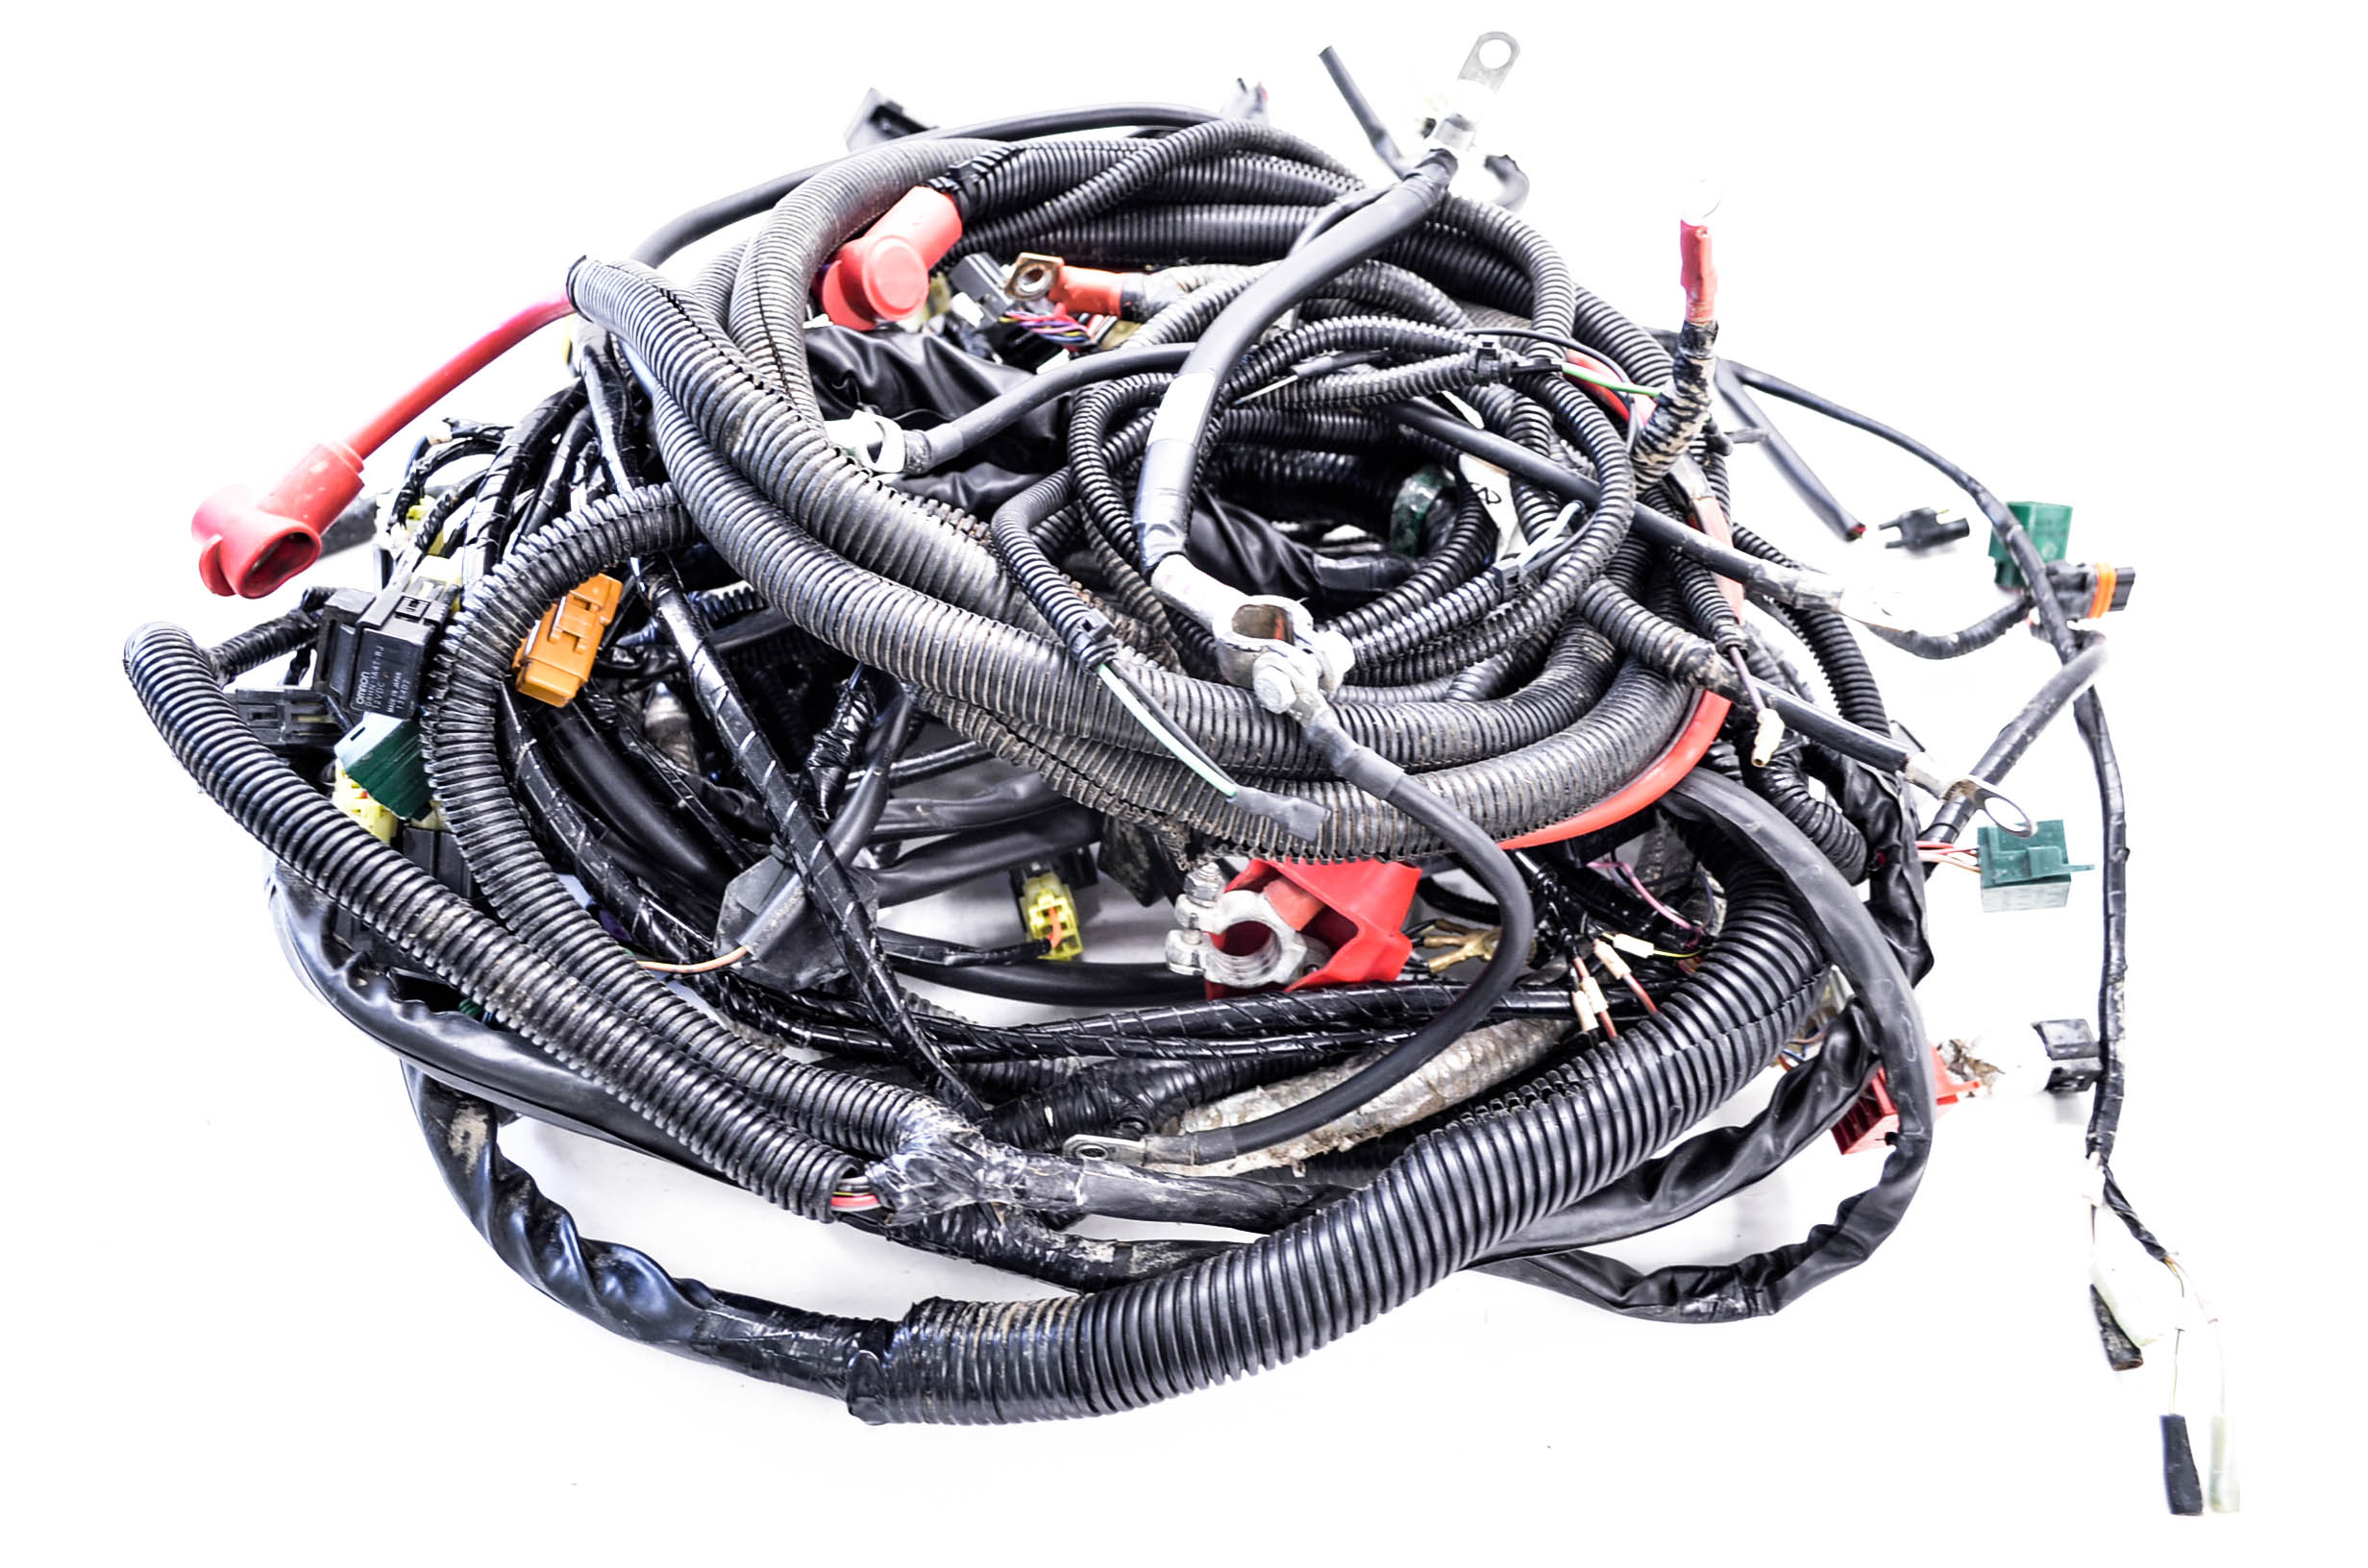 Kawasaki Mule Wiring Harness - wiring diagrams